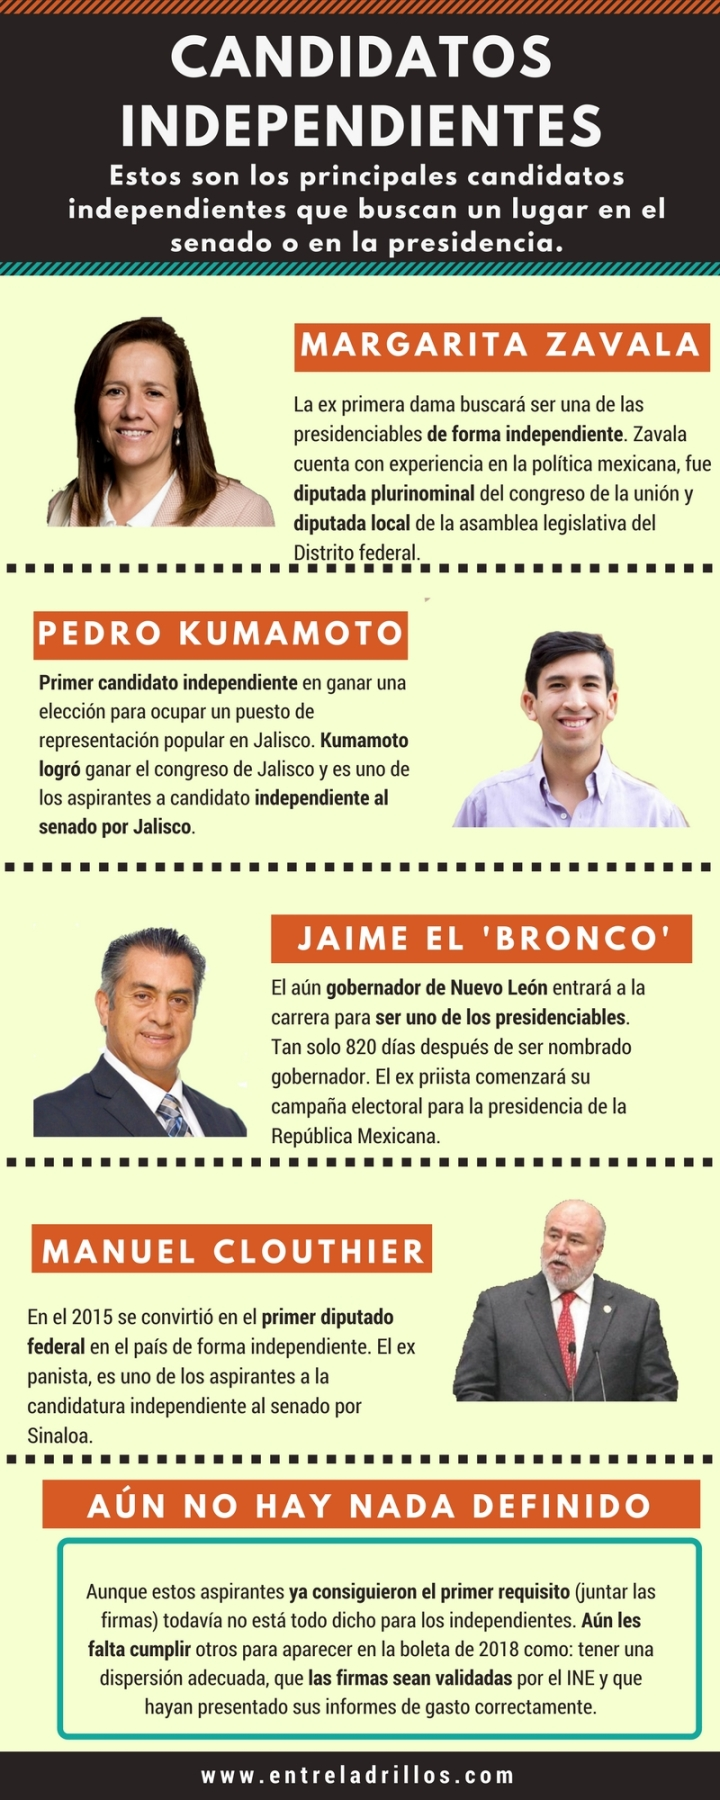 Candidatos independientes OK